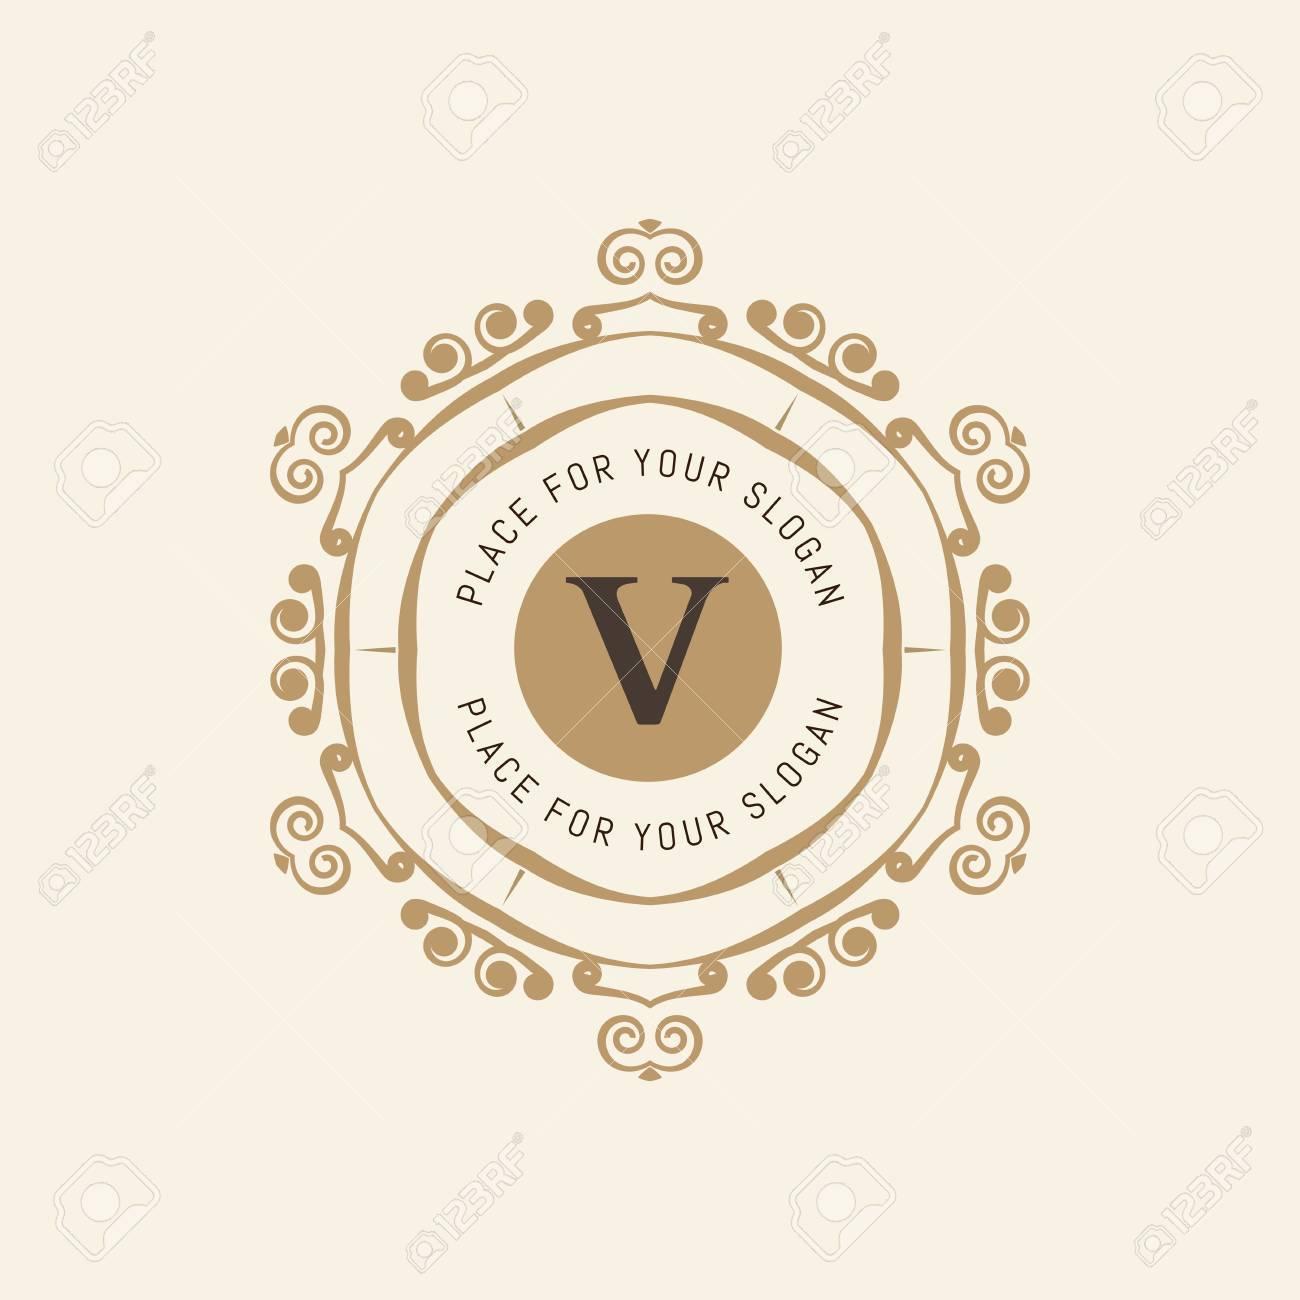 The Letter V Flourishes Calligraphic Monogram Emblem Template Luxury Elegant Frame Ornament Line Logo